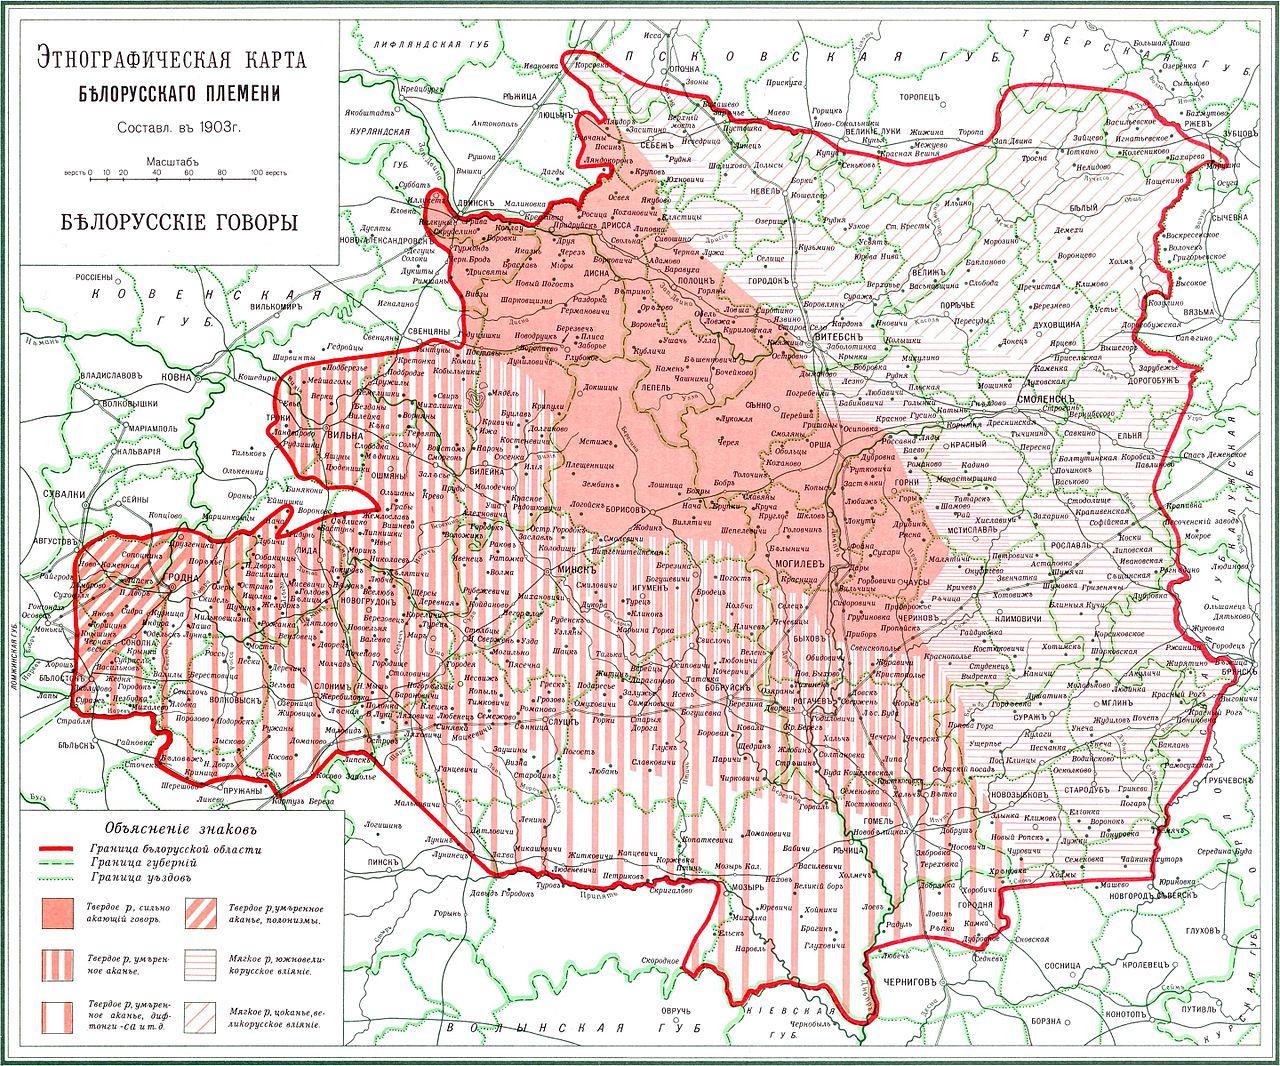 https://upload.wikimedia.org/wikipedia/commons/thumb/2/29/Belarusians_1903.jpg/1280px-Belarusians_1903.jpg